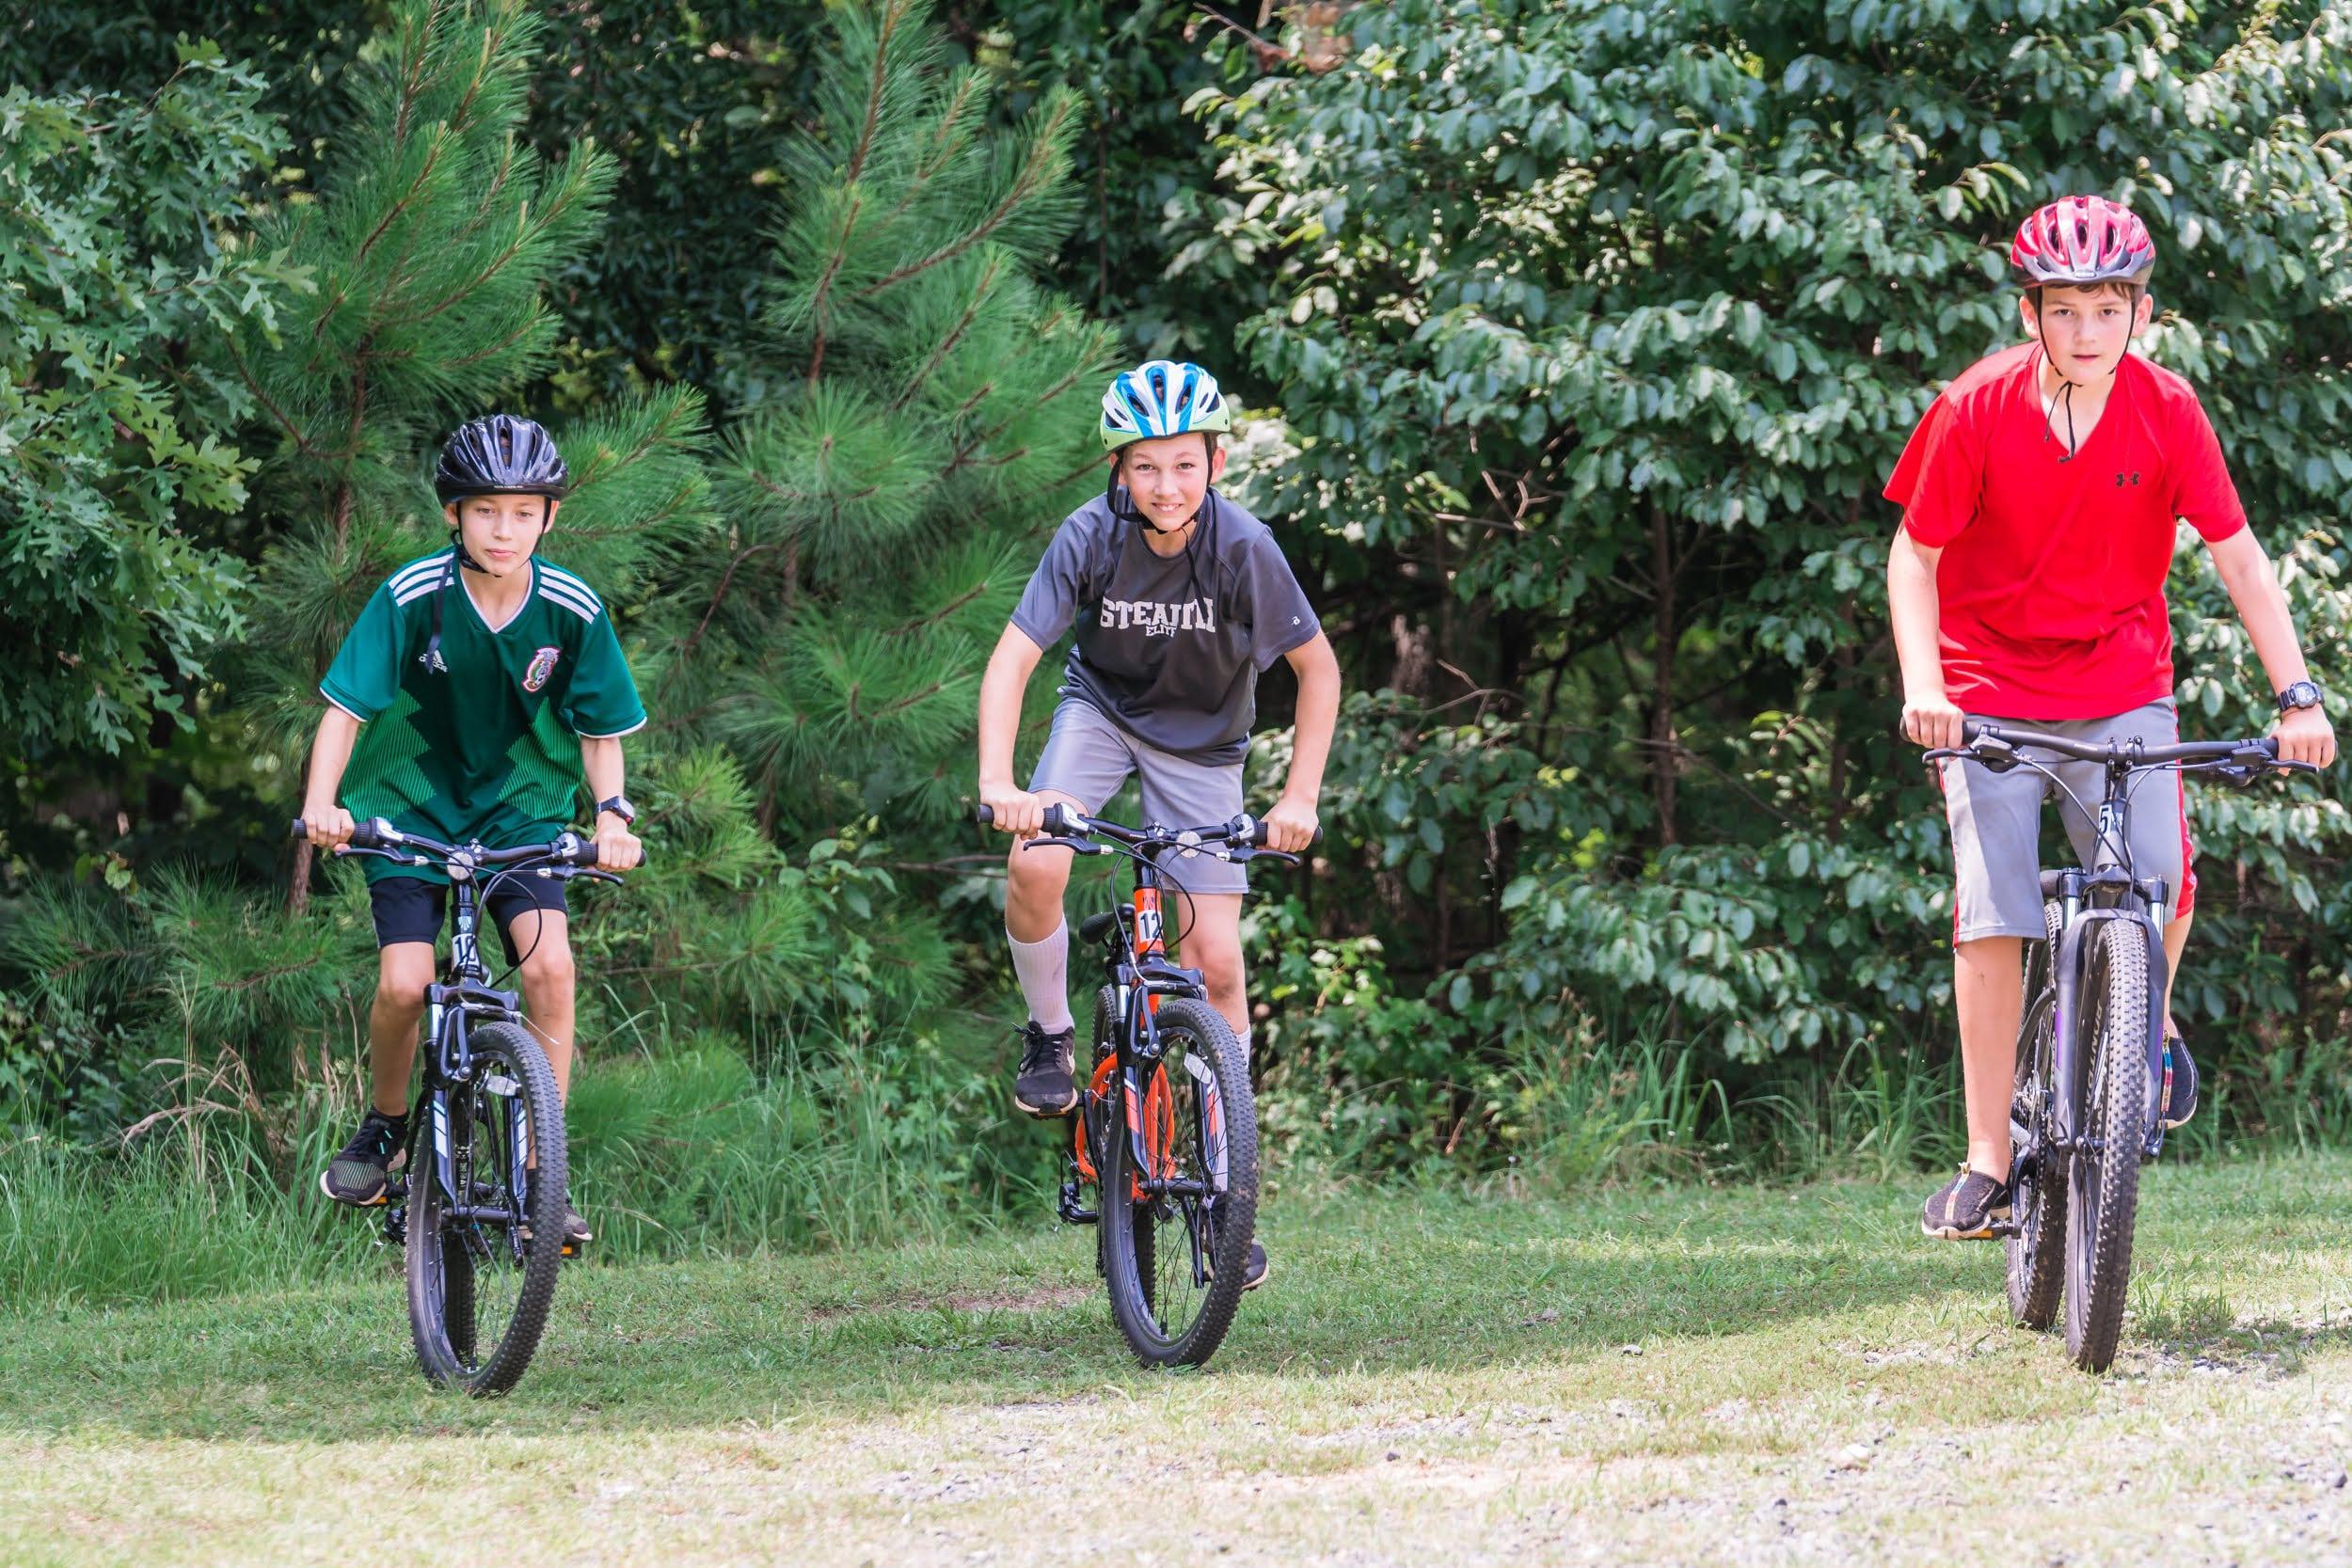 Boys mountain biking at Greenway Summer Camp